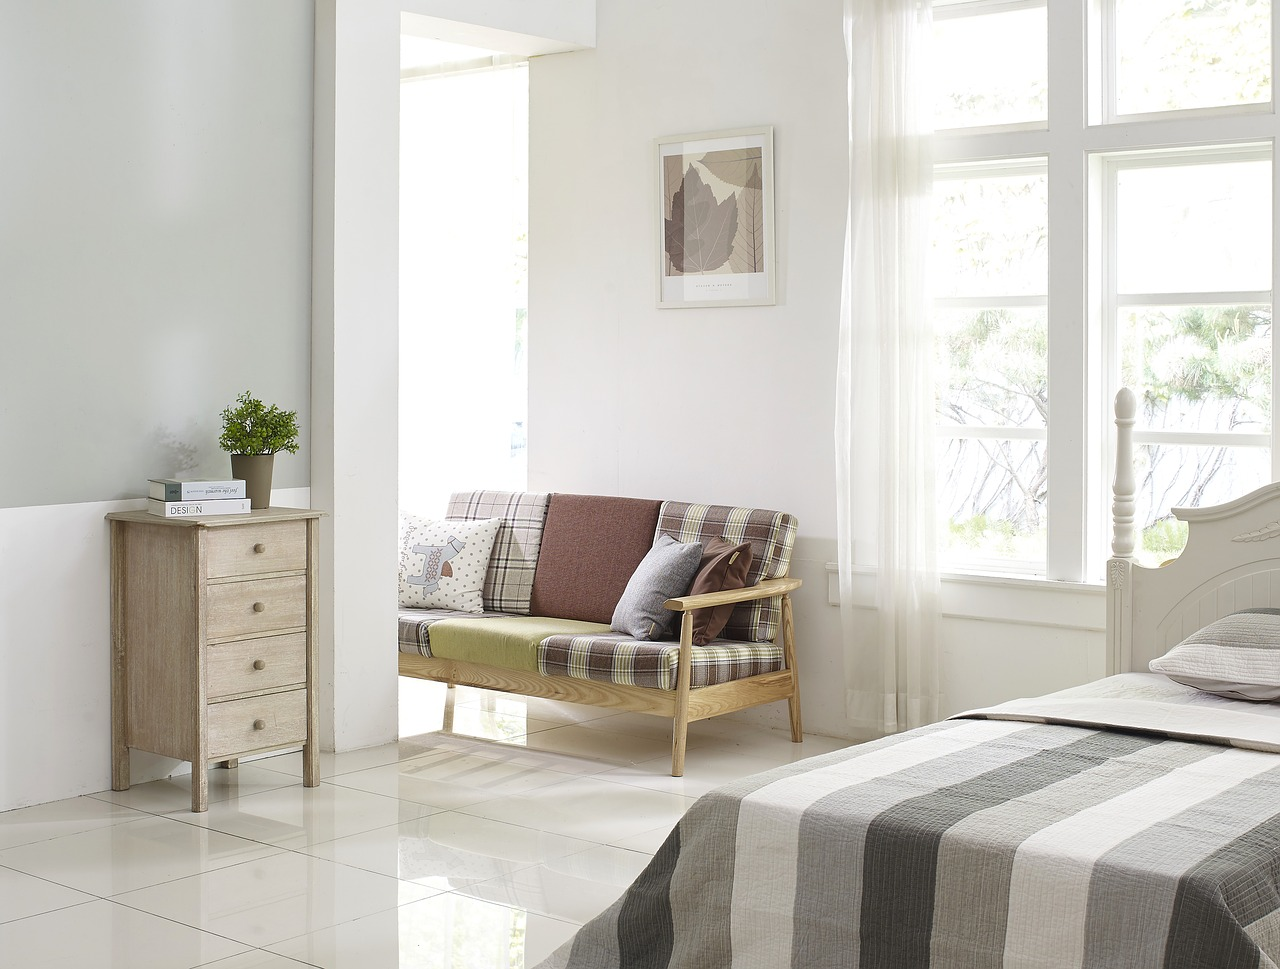 Bedroom Cupboard Bed Room Sofa Window Living Room